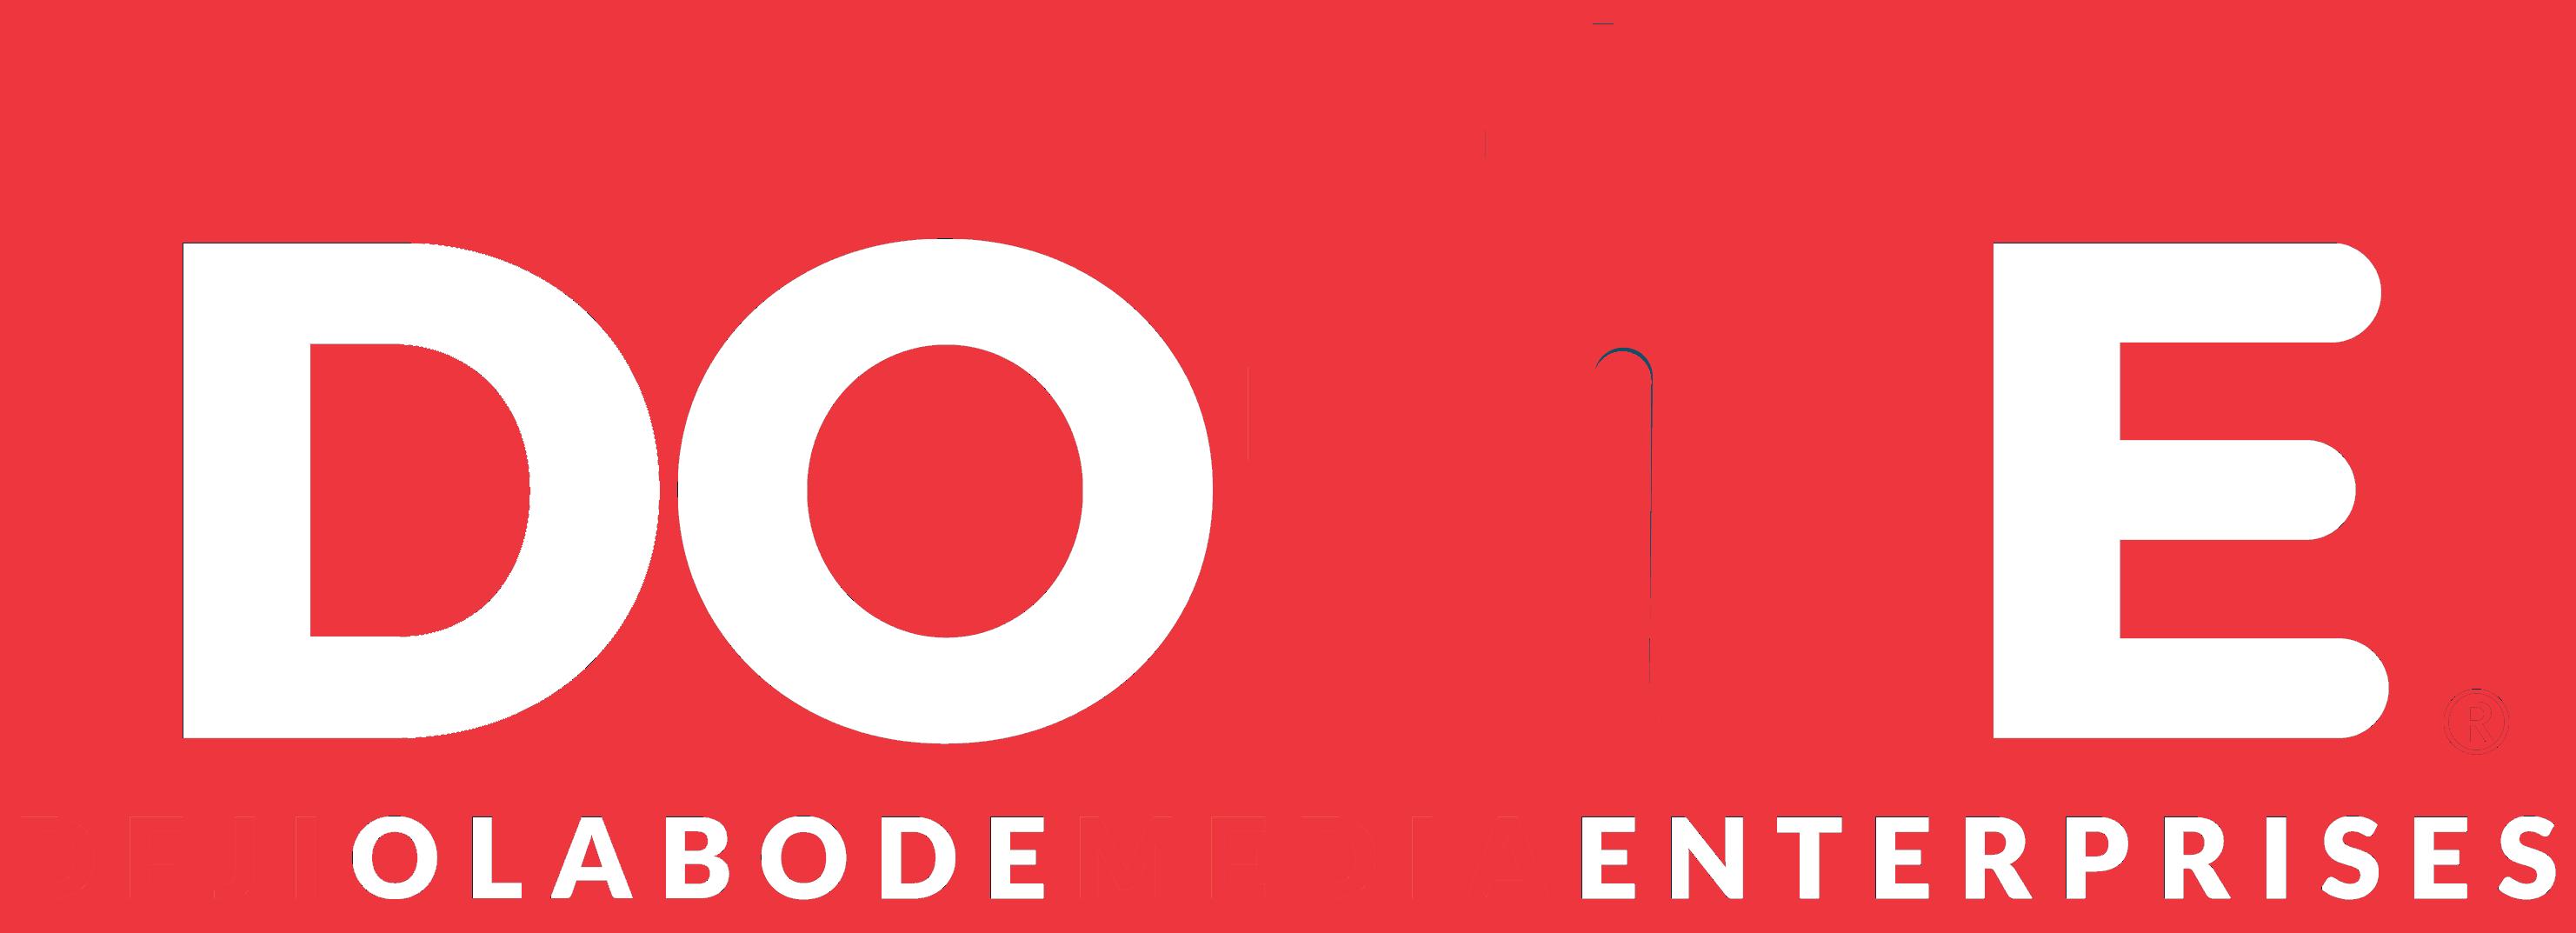 Deji Olabode Media Enterprises white Logo